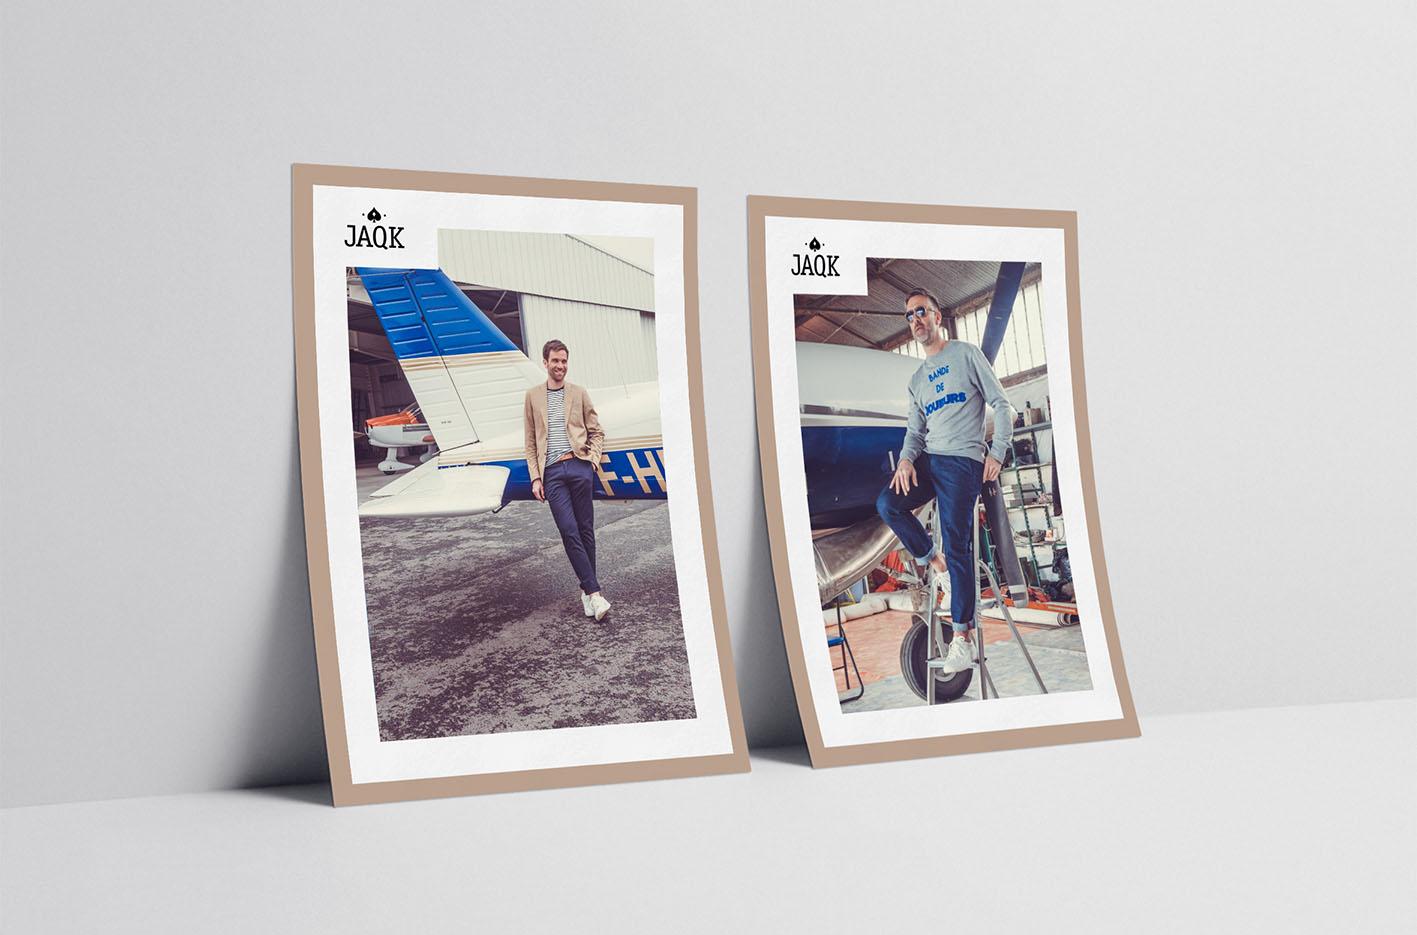 jaqk-frame-2-mai-2018